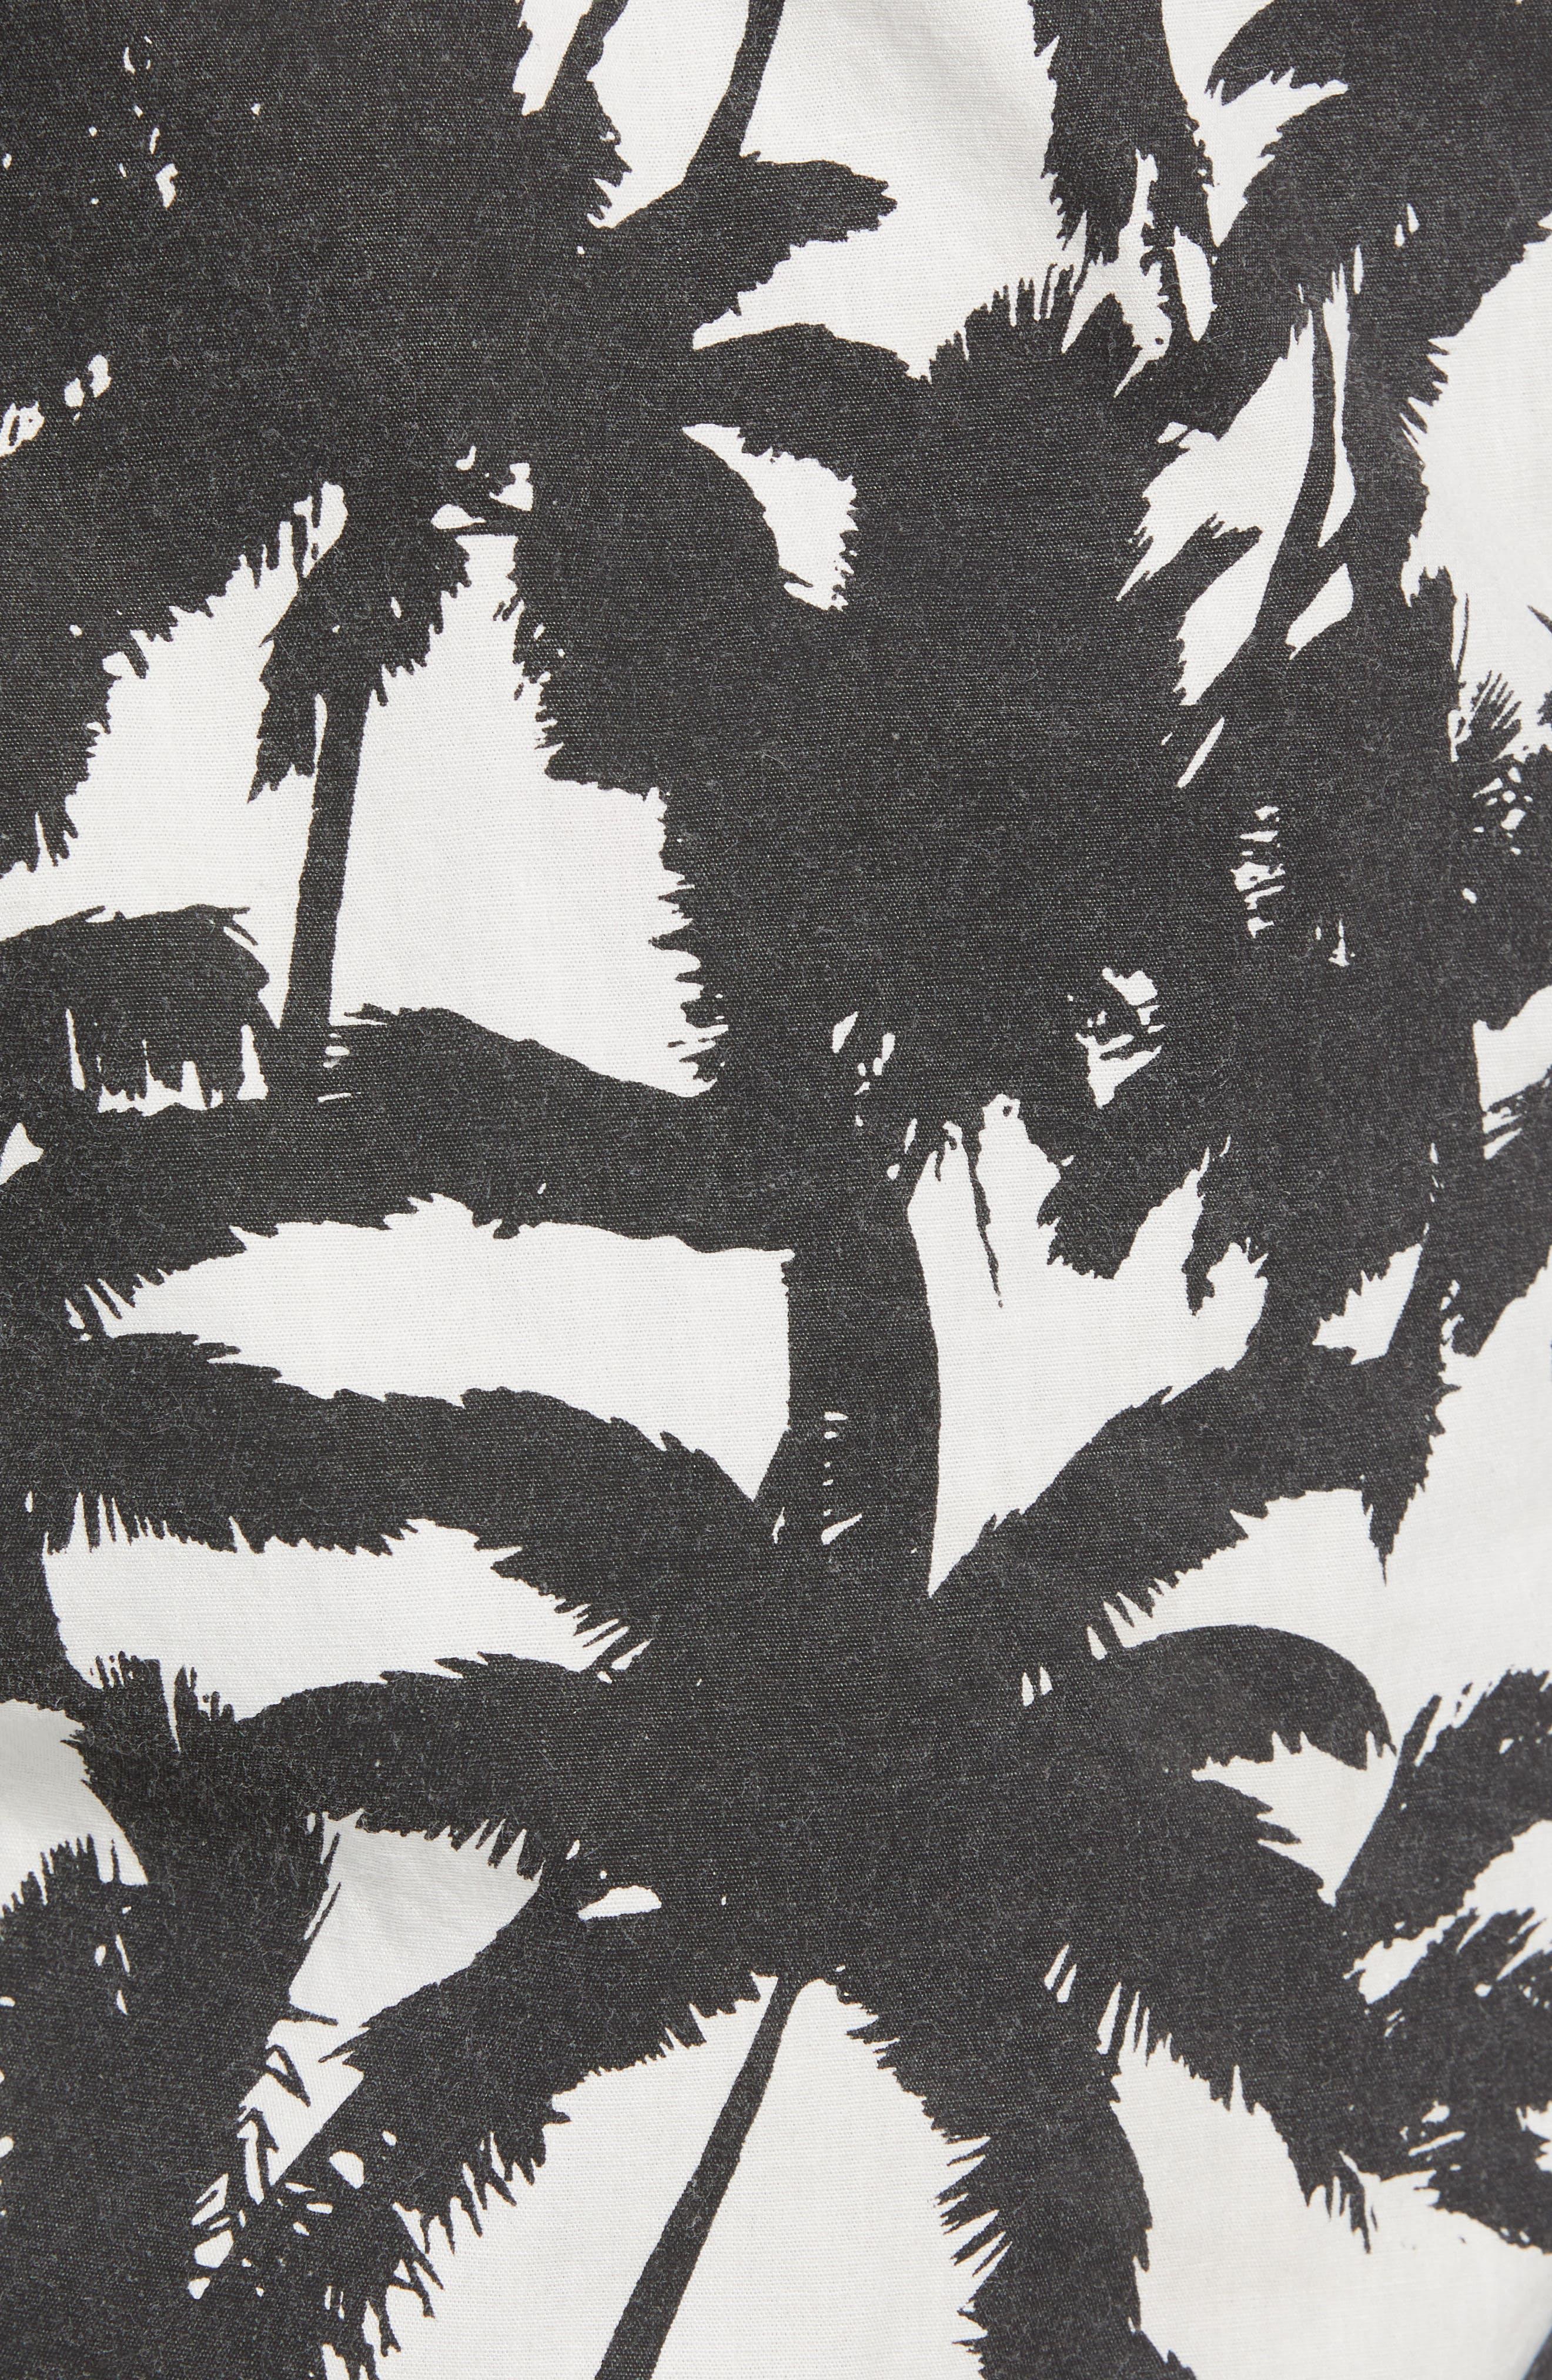 Easy Boardie - Venice Swim Trunks,                             Alternate thumbnail 5, color,                             100